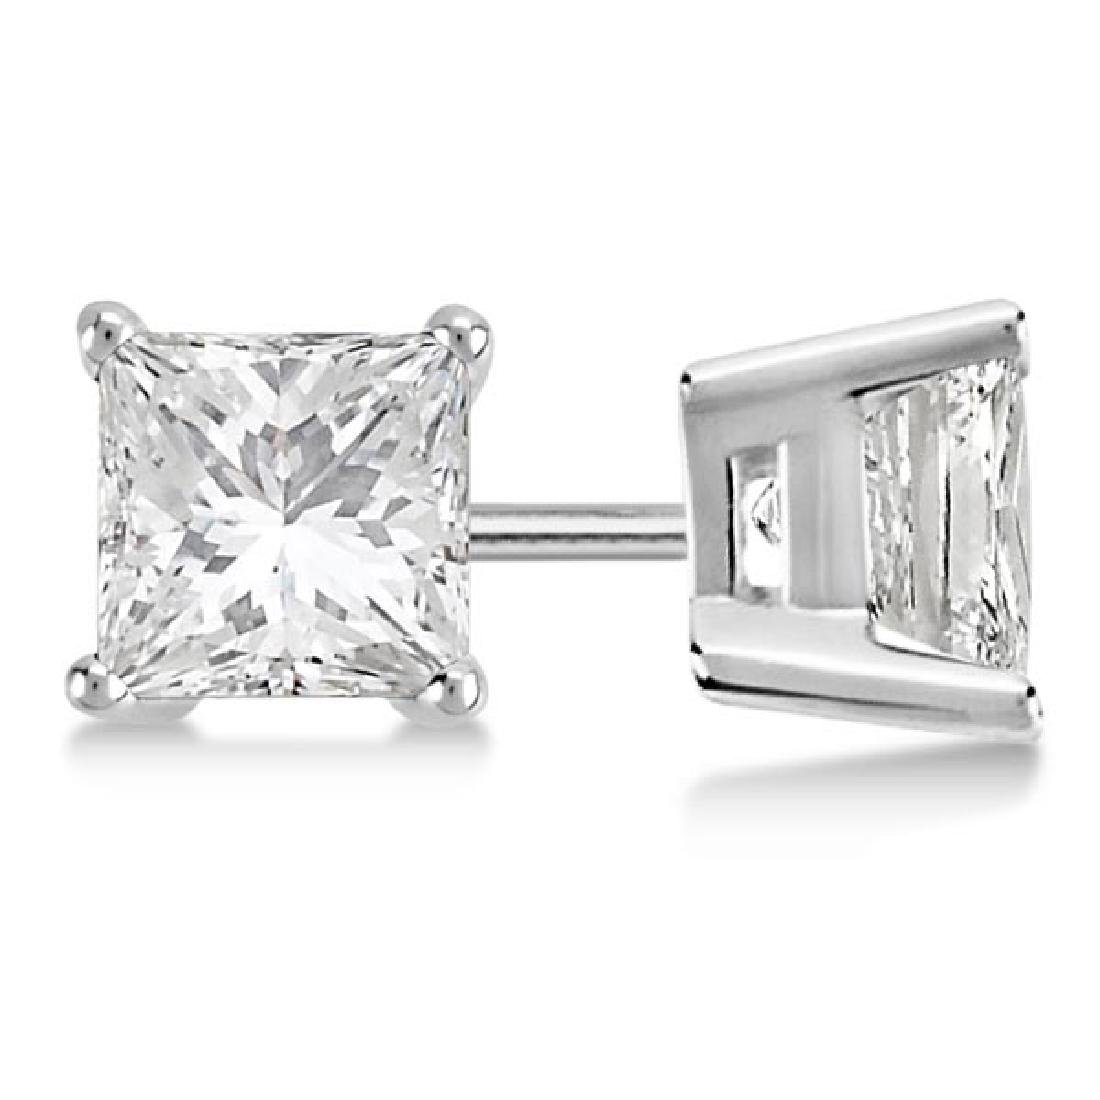 Certified 1.03 CTW Princess Diamond Stud Earrings G/SI2